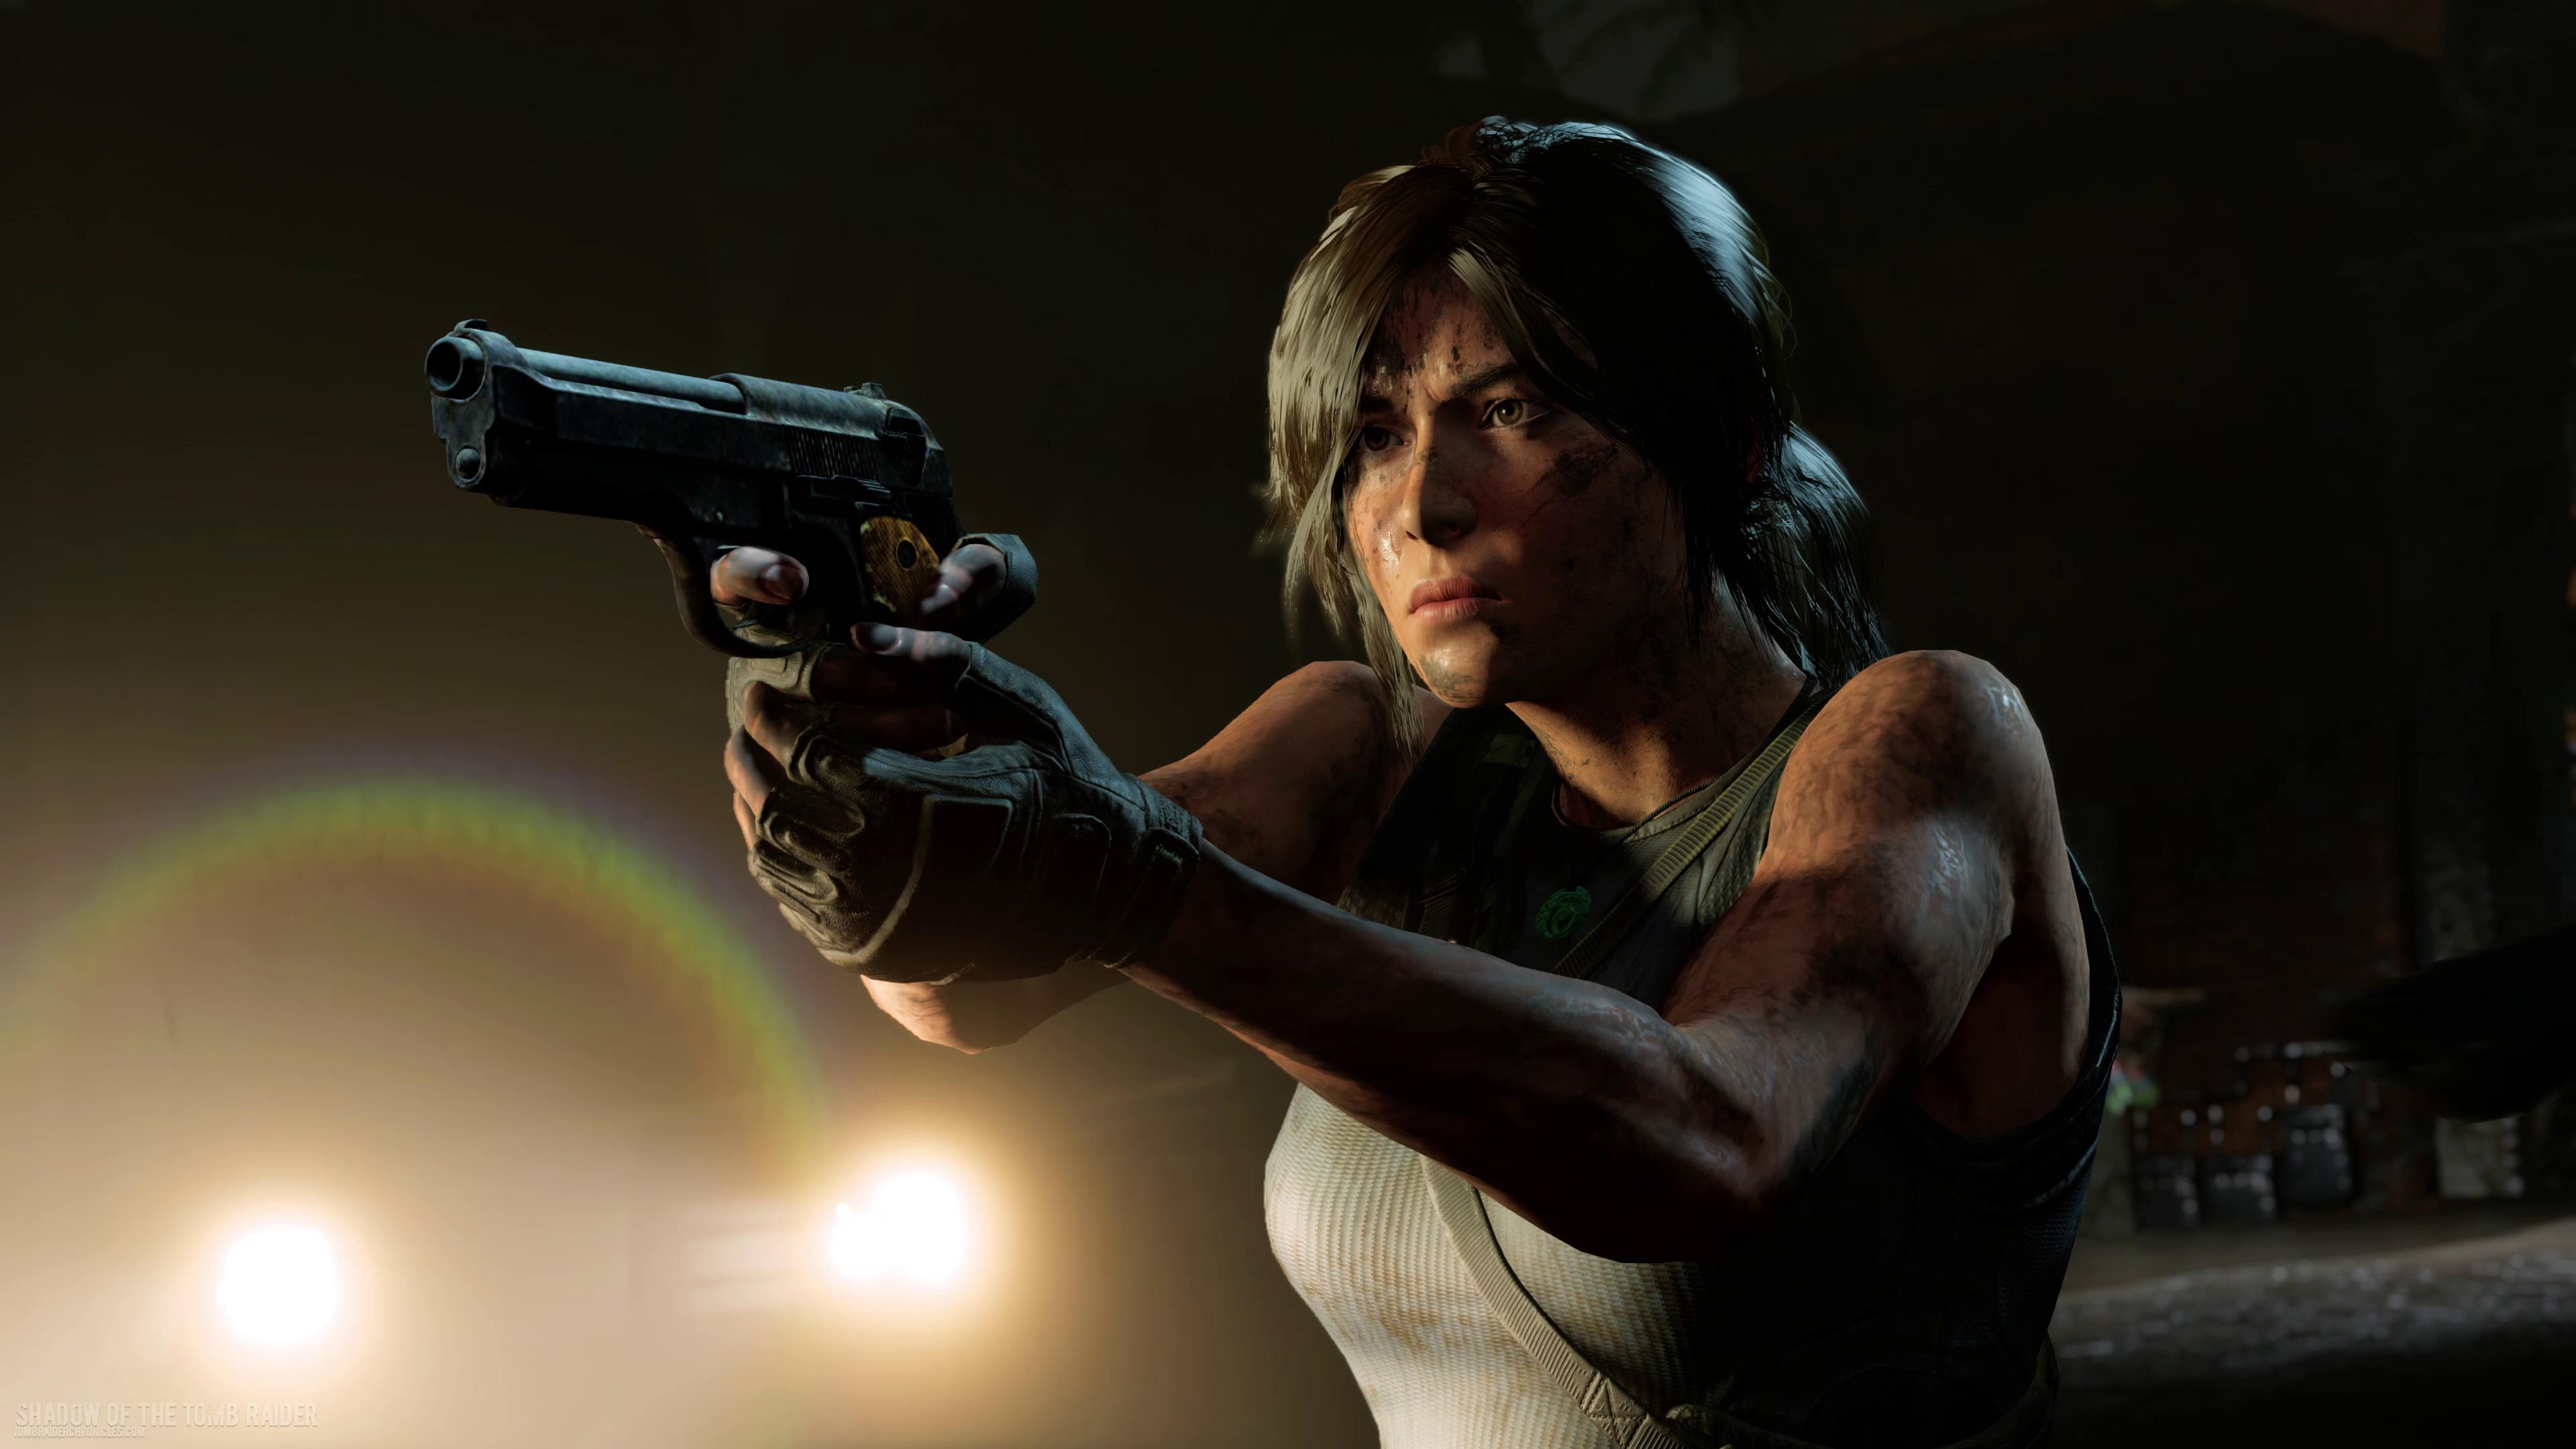 Shadow Of The Tomb Raider Lara Croft And Pistol 4k Ultra